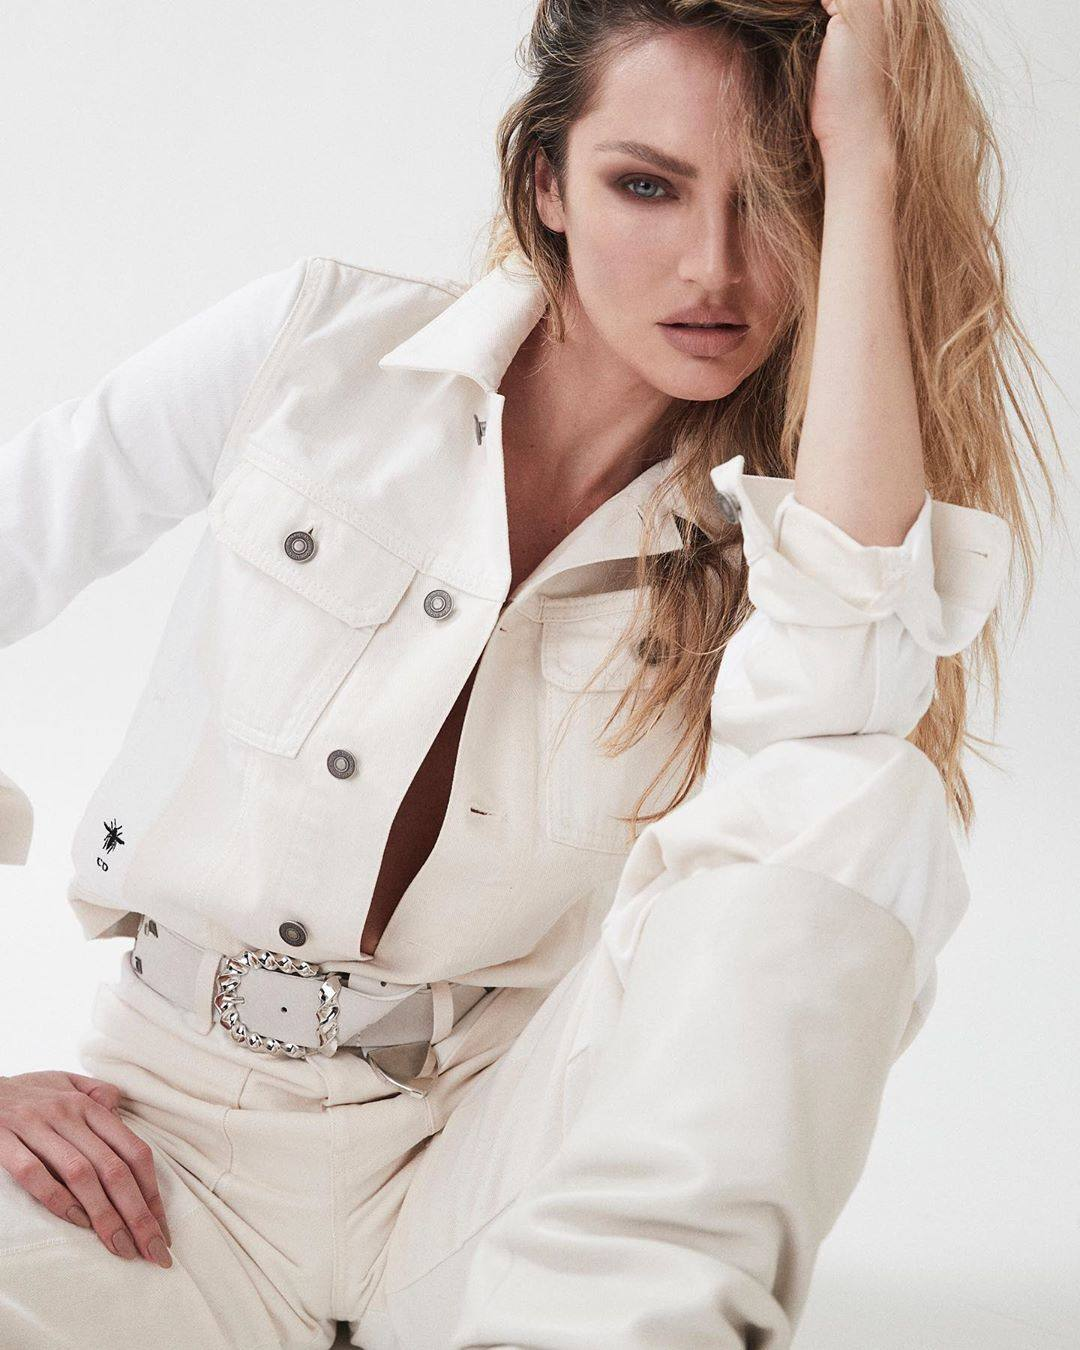 Candice Swanepole Beautiful Shoot